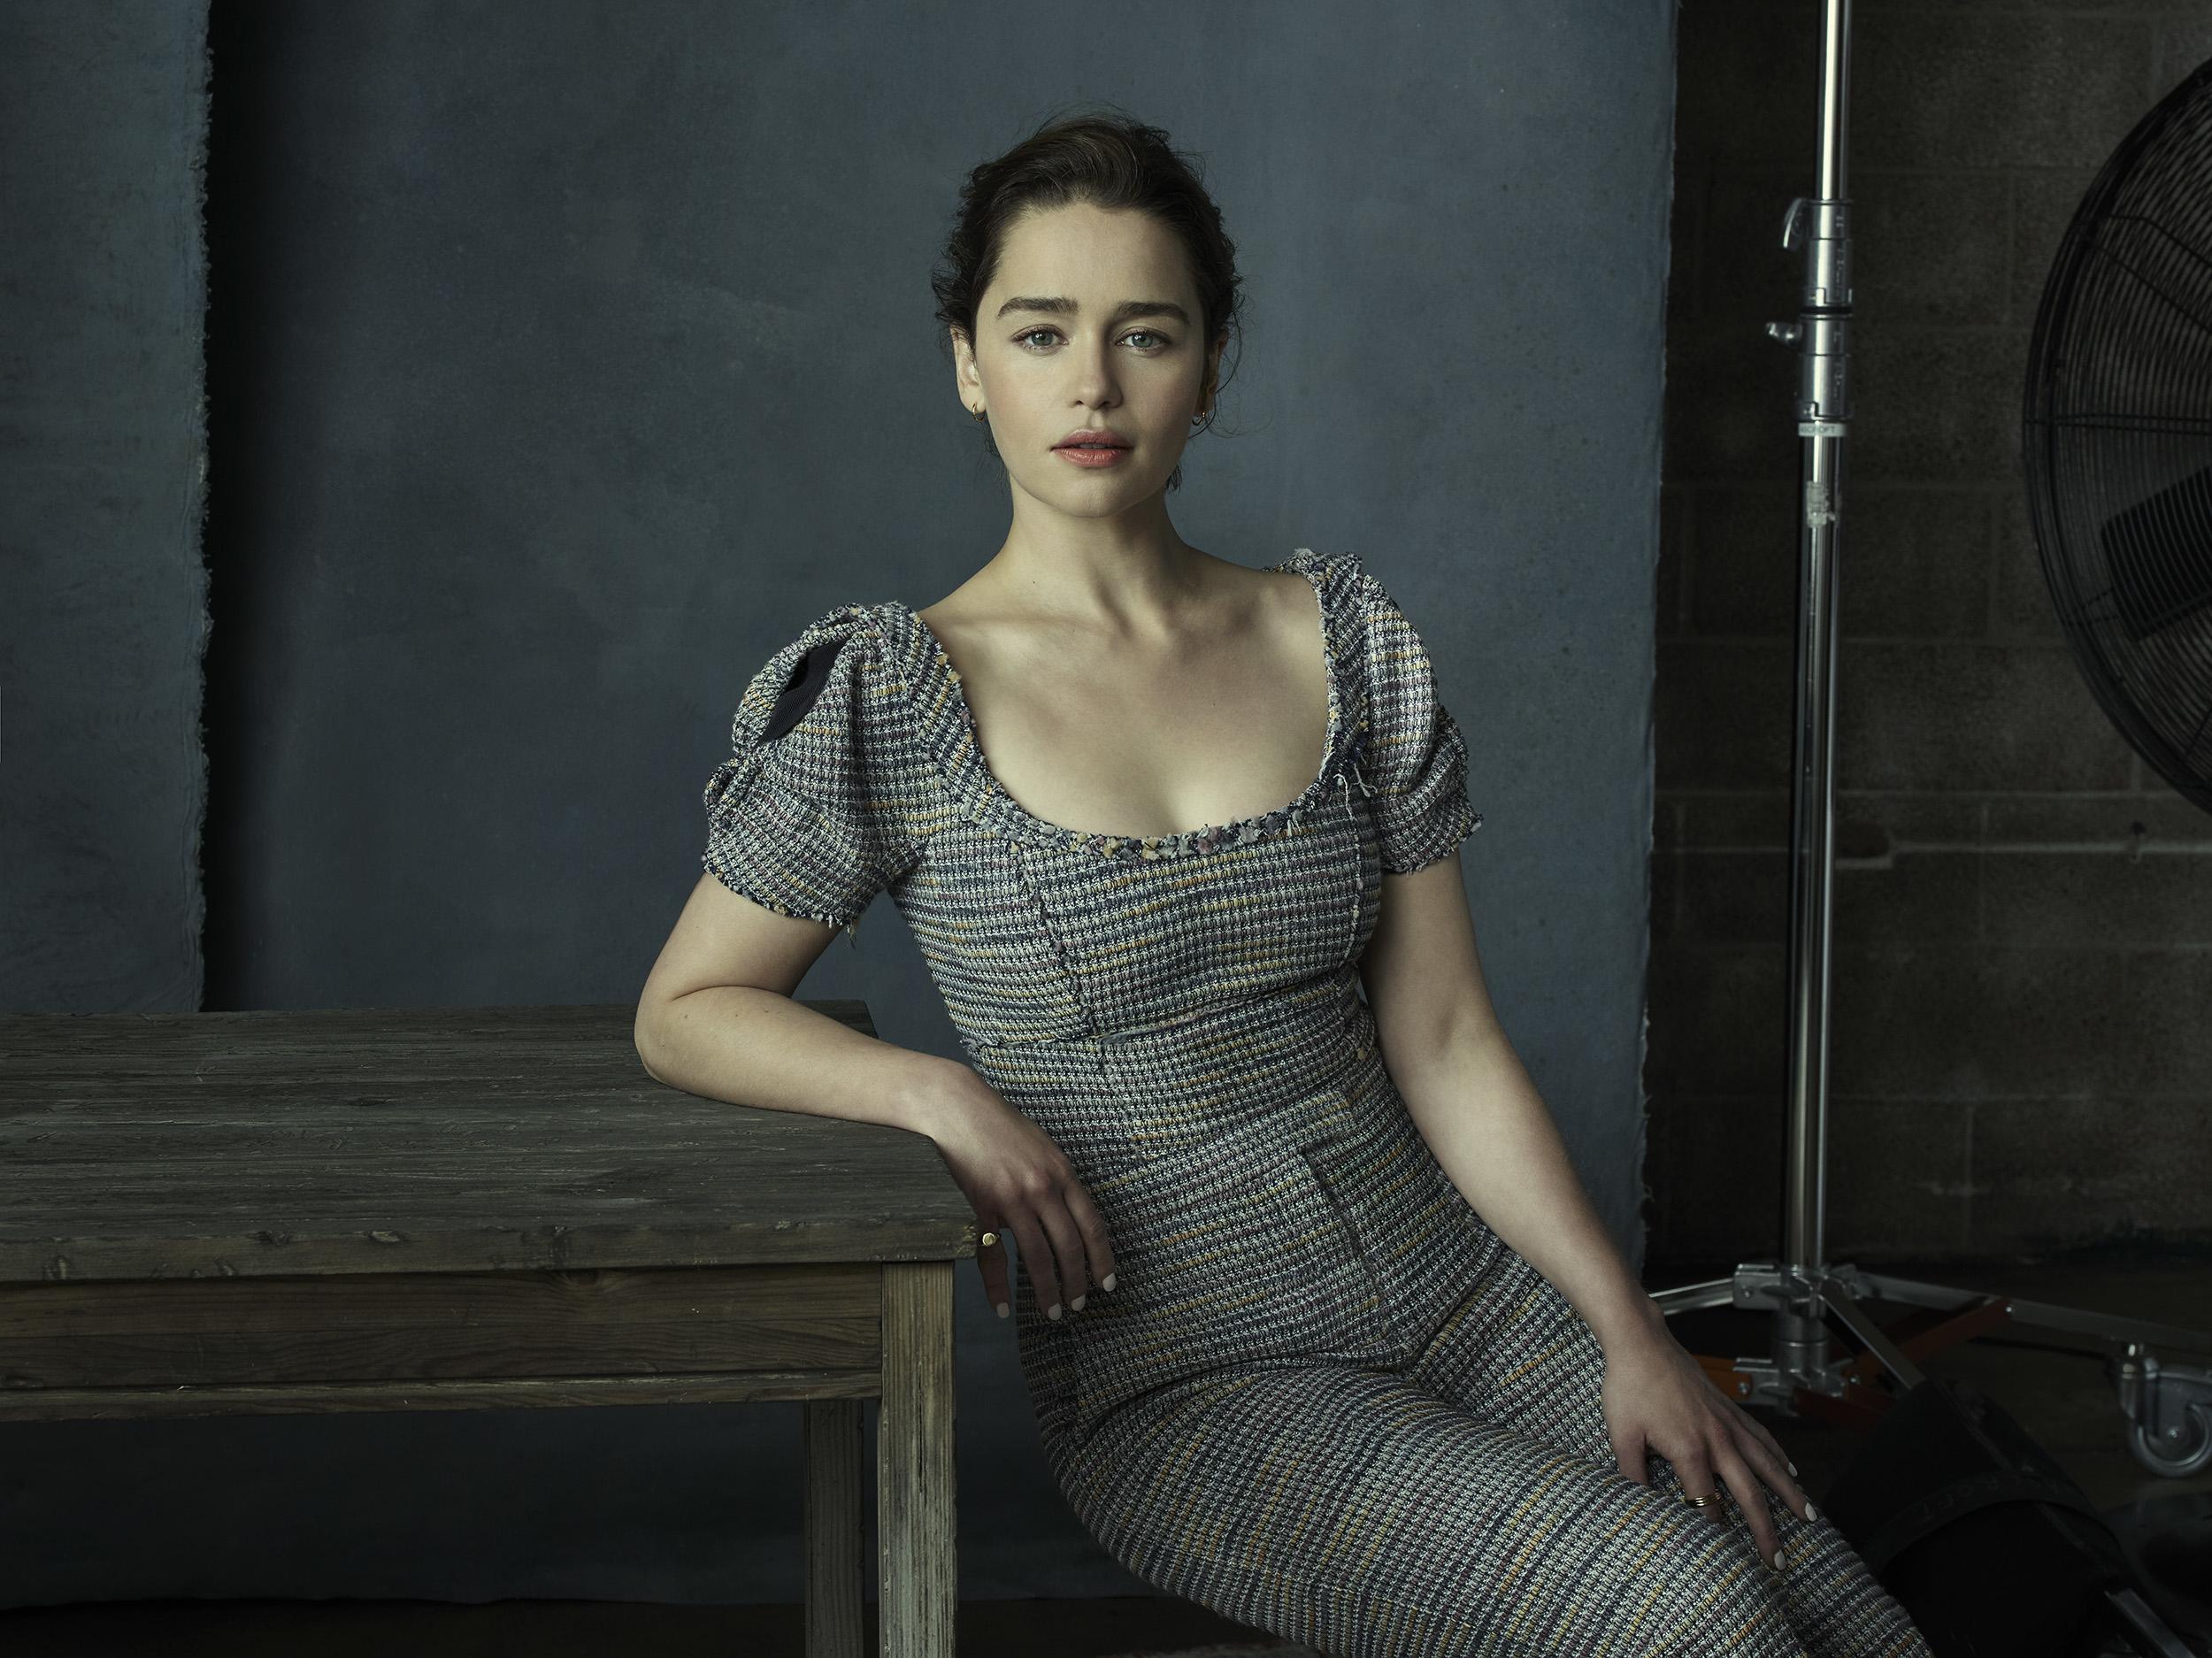 Emilia Clarke Hd Wallpaper Background Image 2500x1874 Id 1050037 Wallpaper Abyss